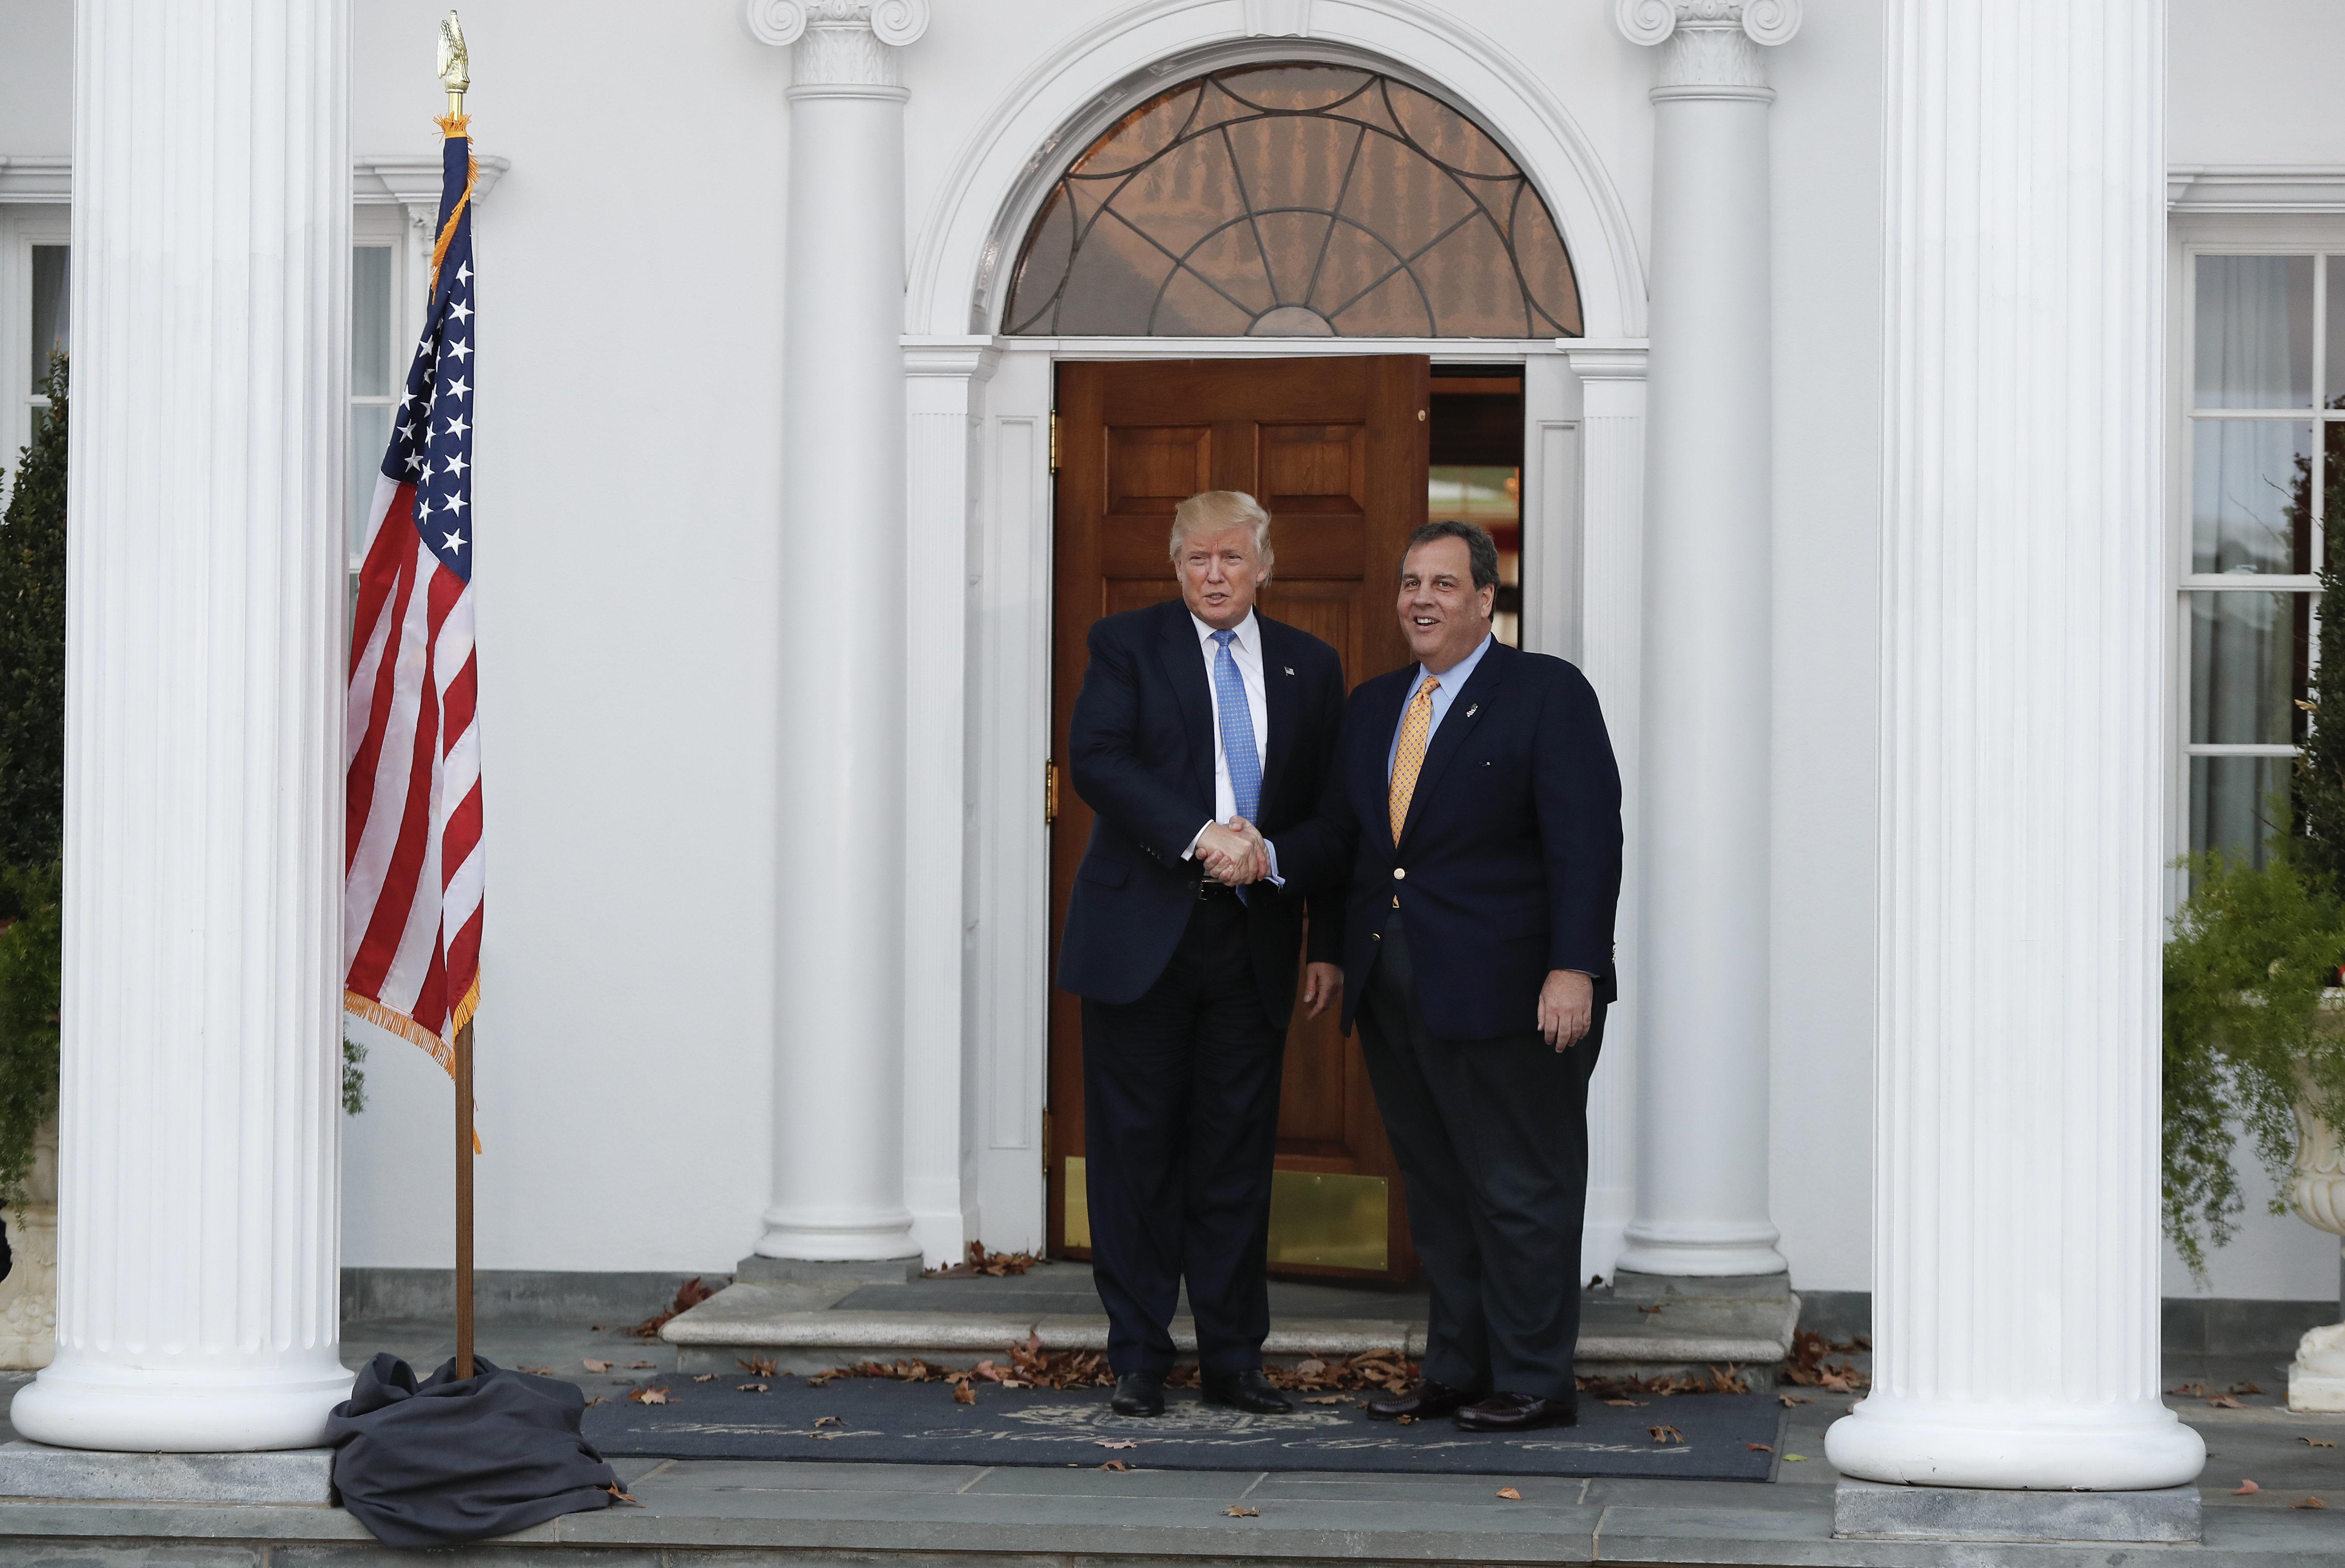 Chris Christie Tears Into Donald Trumps White House Amateurs Grifters Weaklings